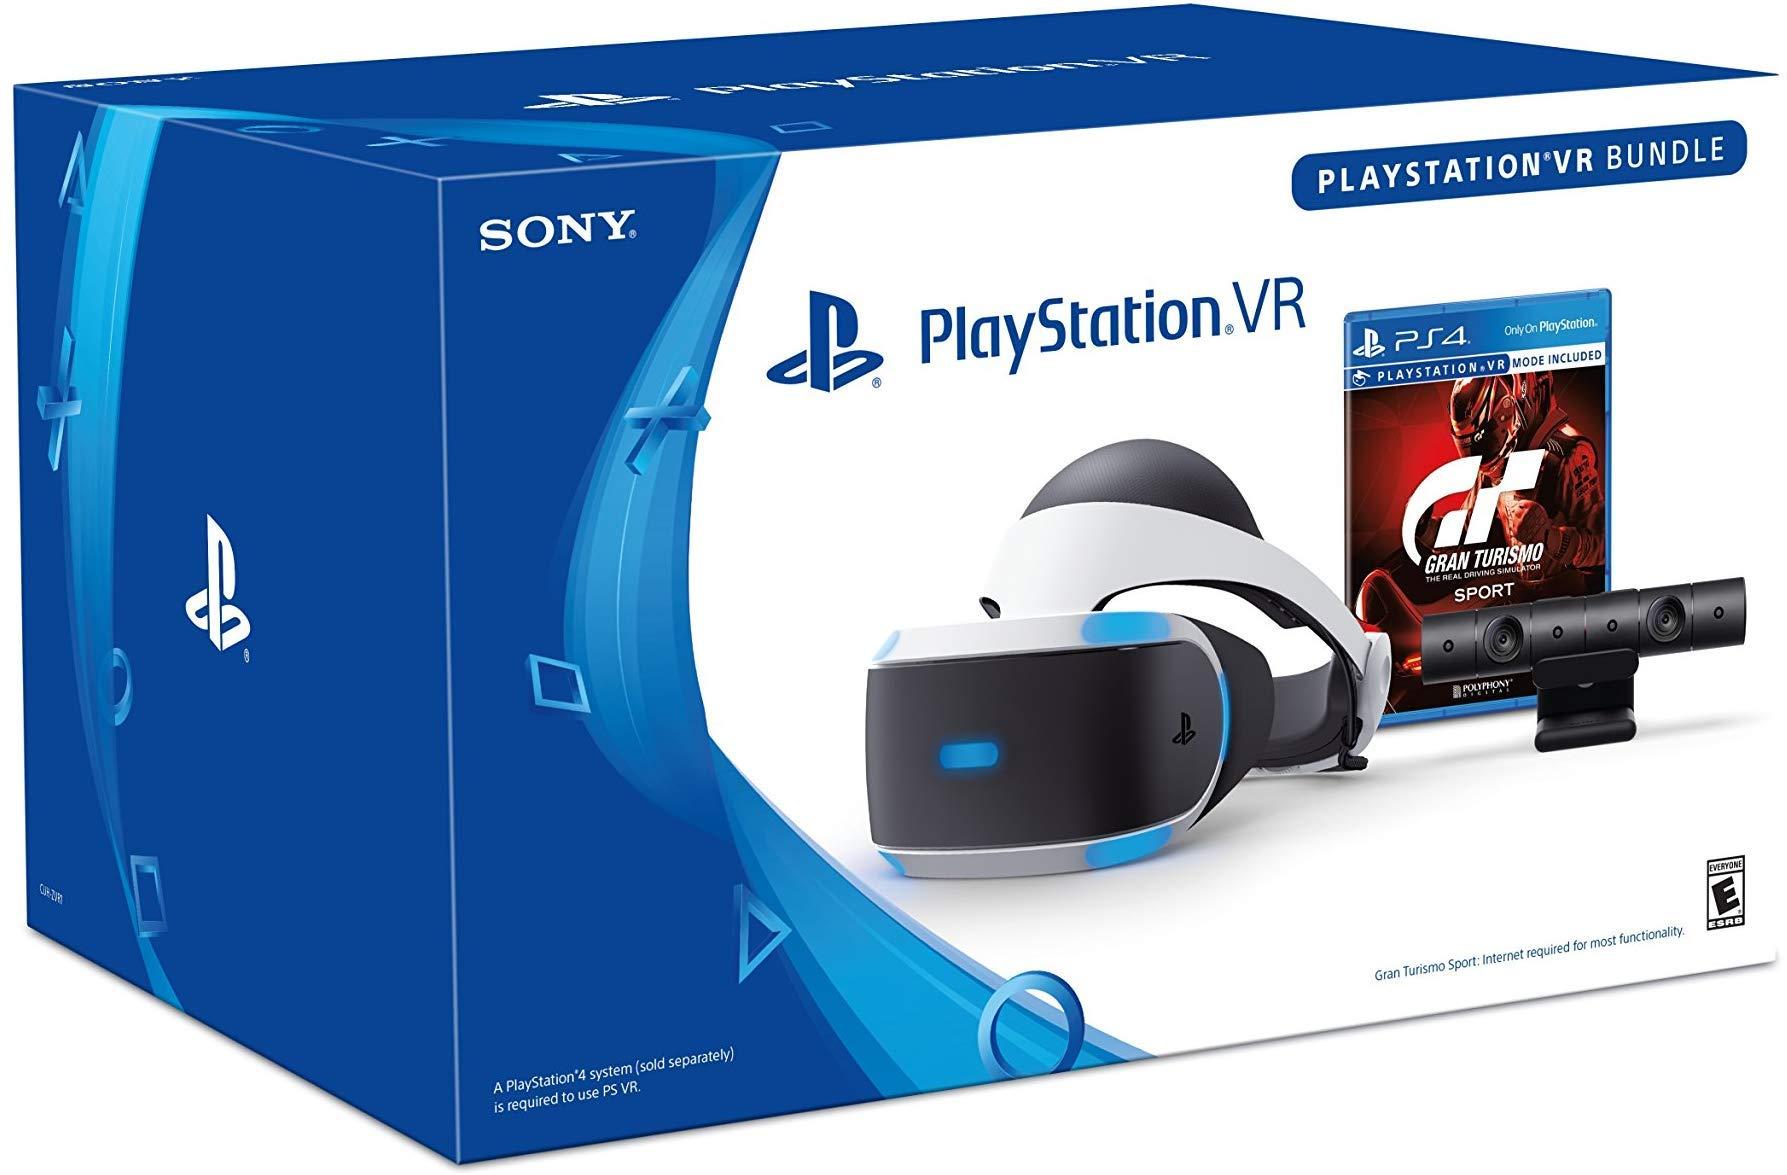 Playstation VR & Gran Turismo Sport Bundle | Advanced VR Display | 3D Audio Technology | 5.7'' OLED 1080p Display | HDMI | USB by Sony